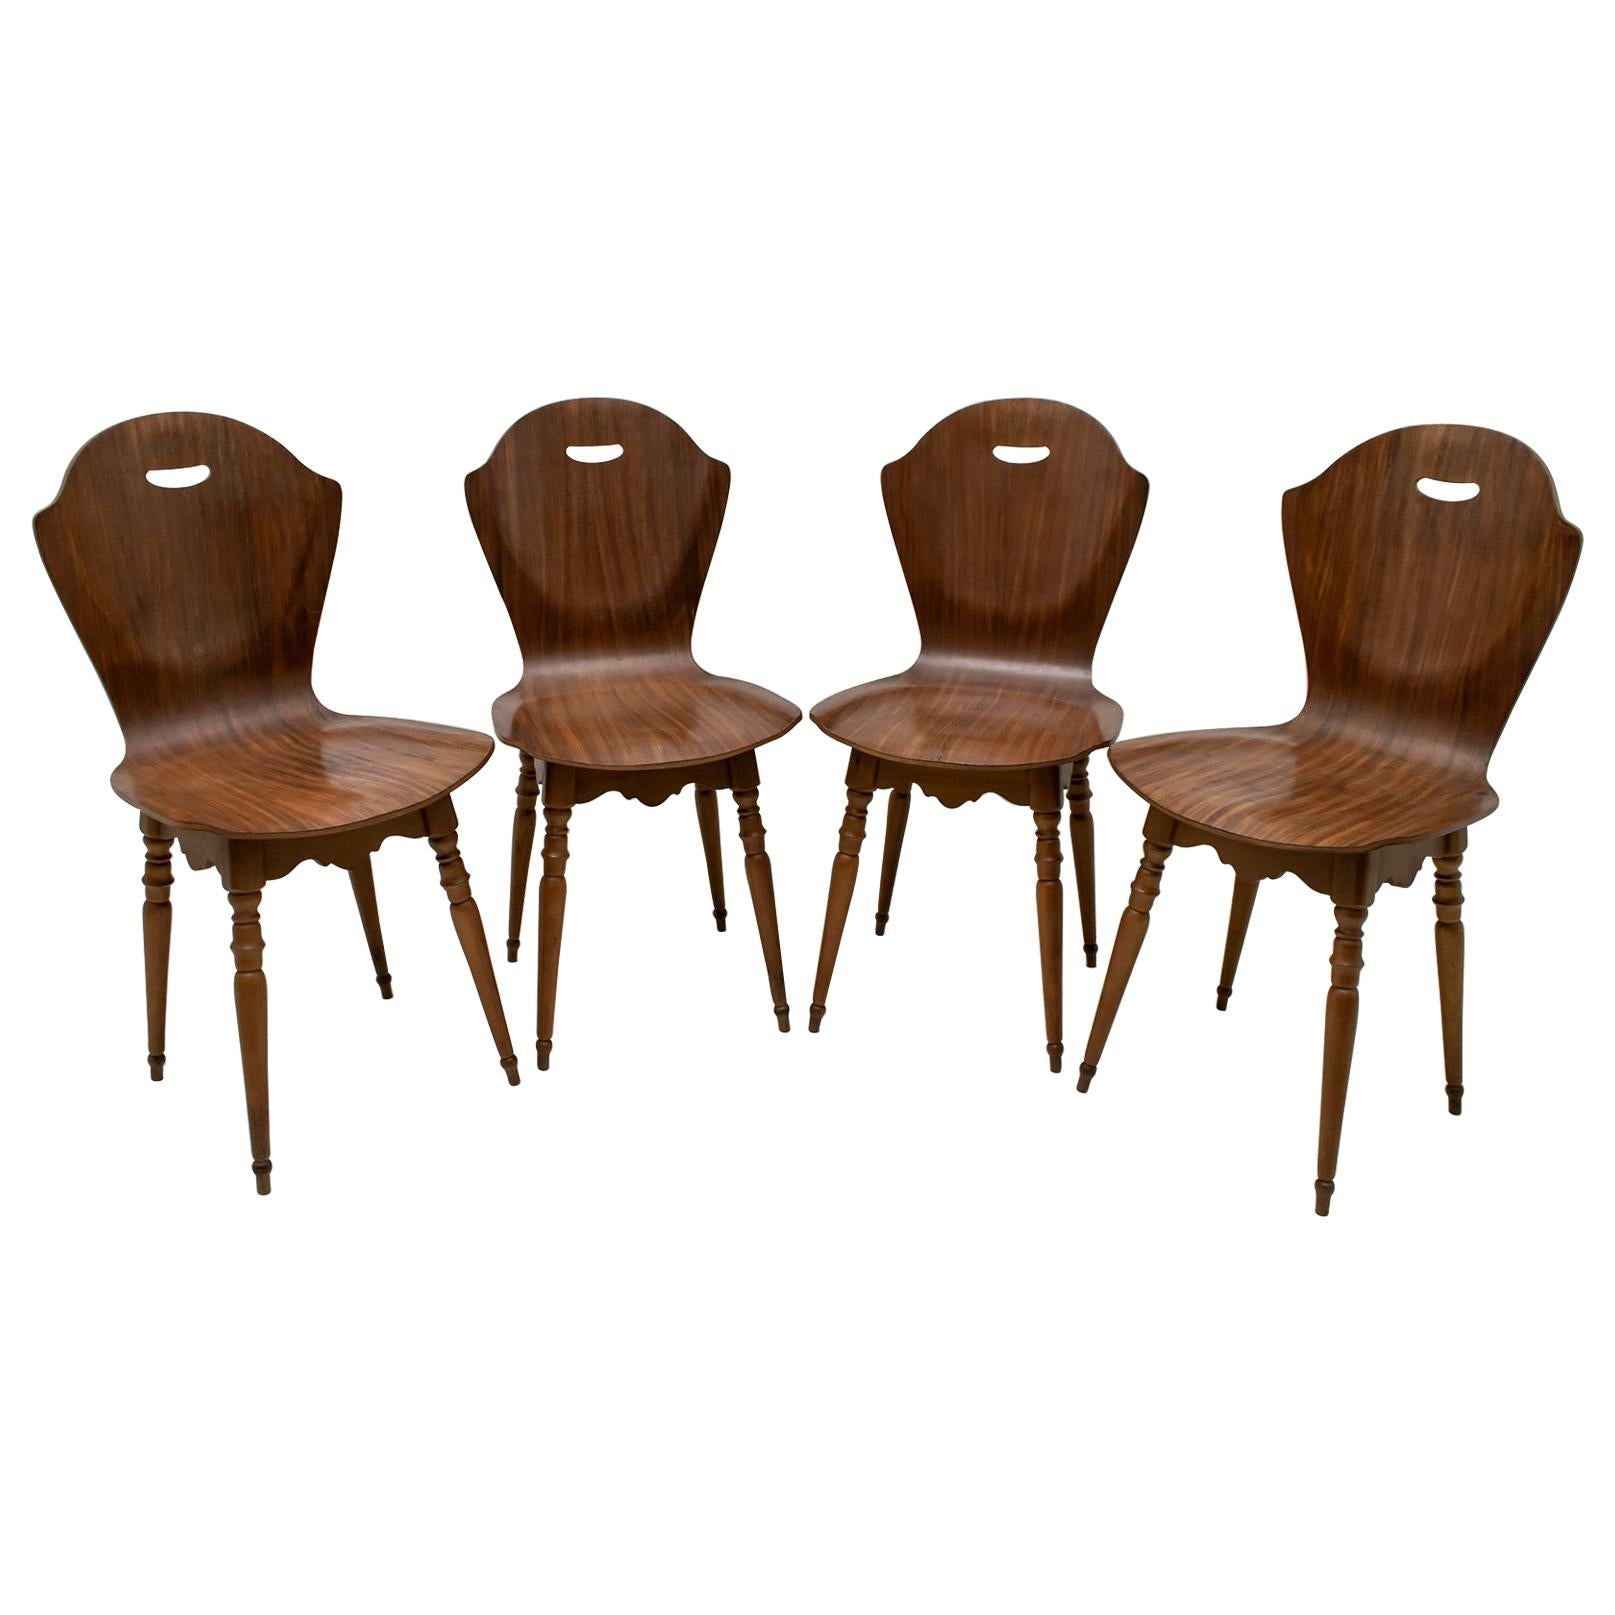 After Carlo Ratti Mid-Century Modern Italian Bentwood Chairs, 1950s